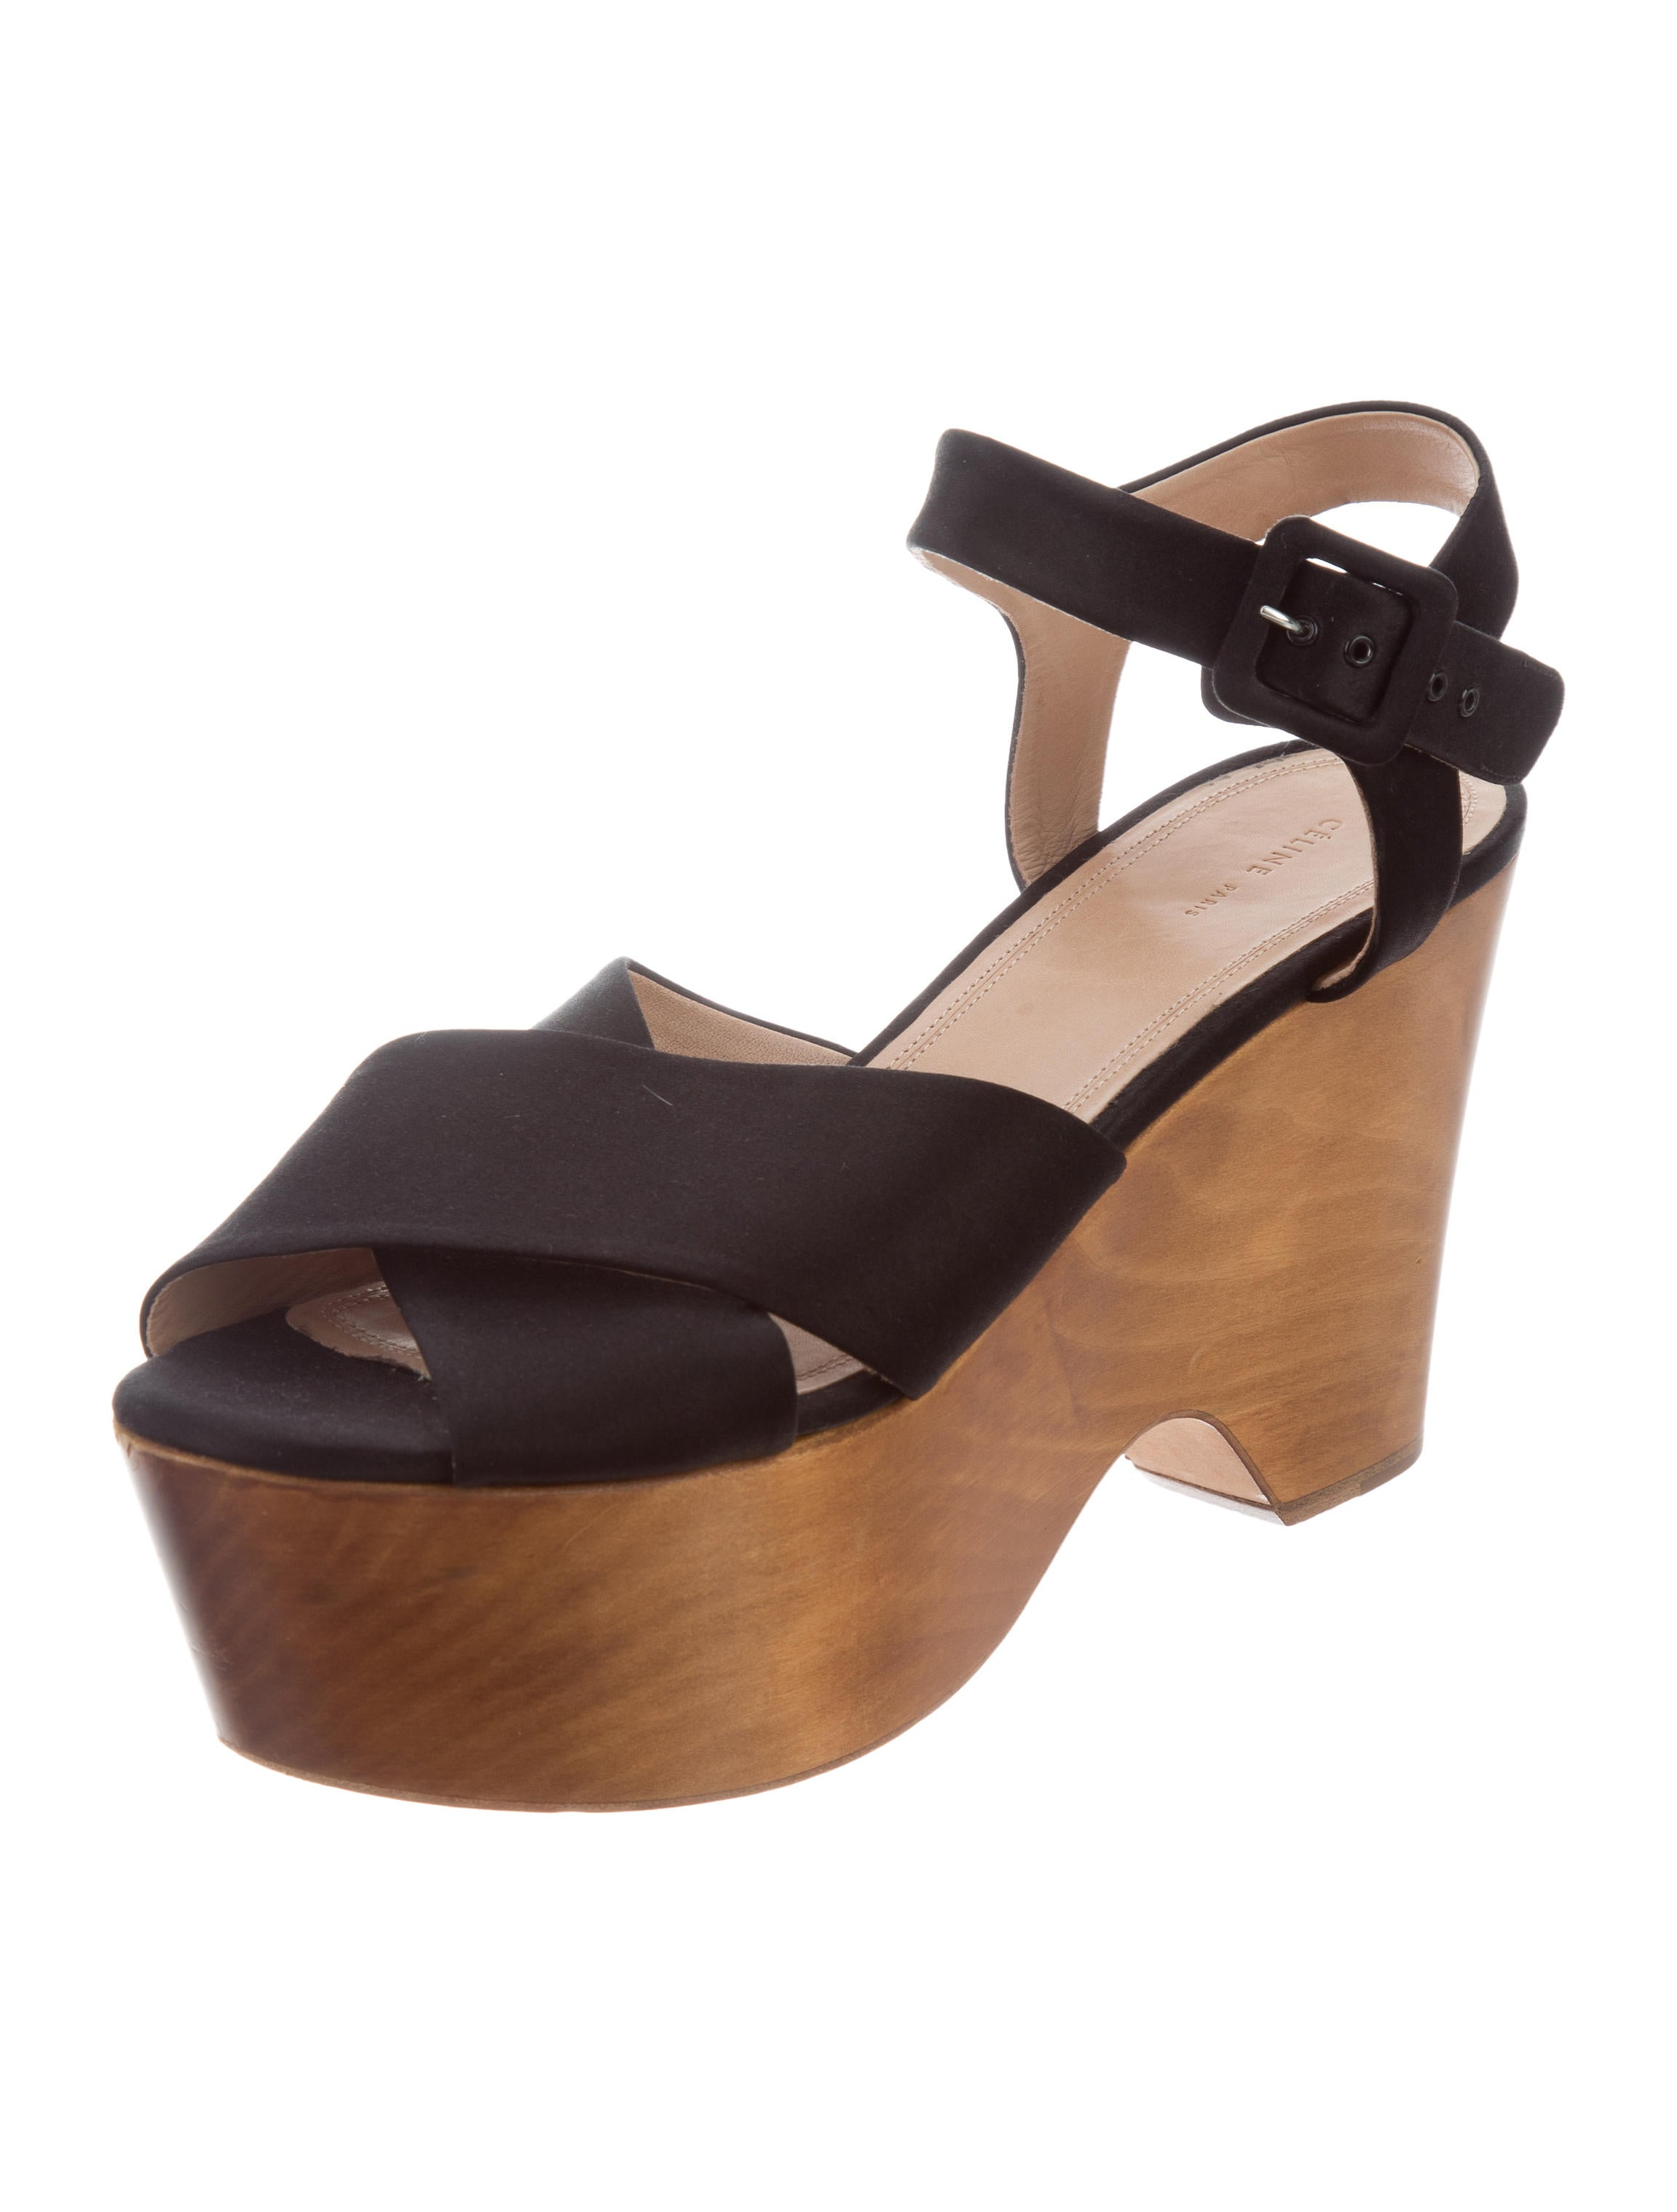 Céline Crossover Platform Sandals buy cheap big discount rmwR67H